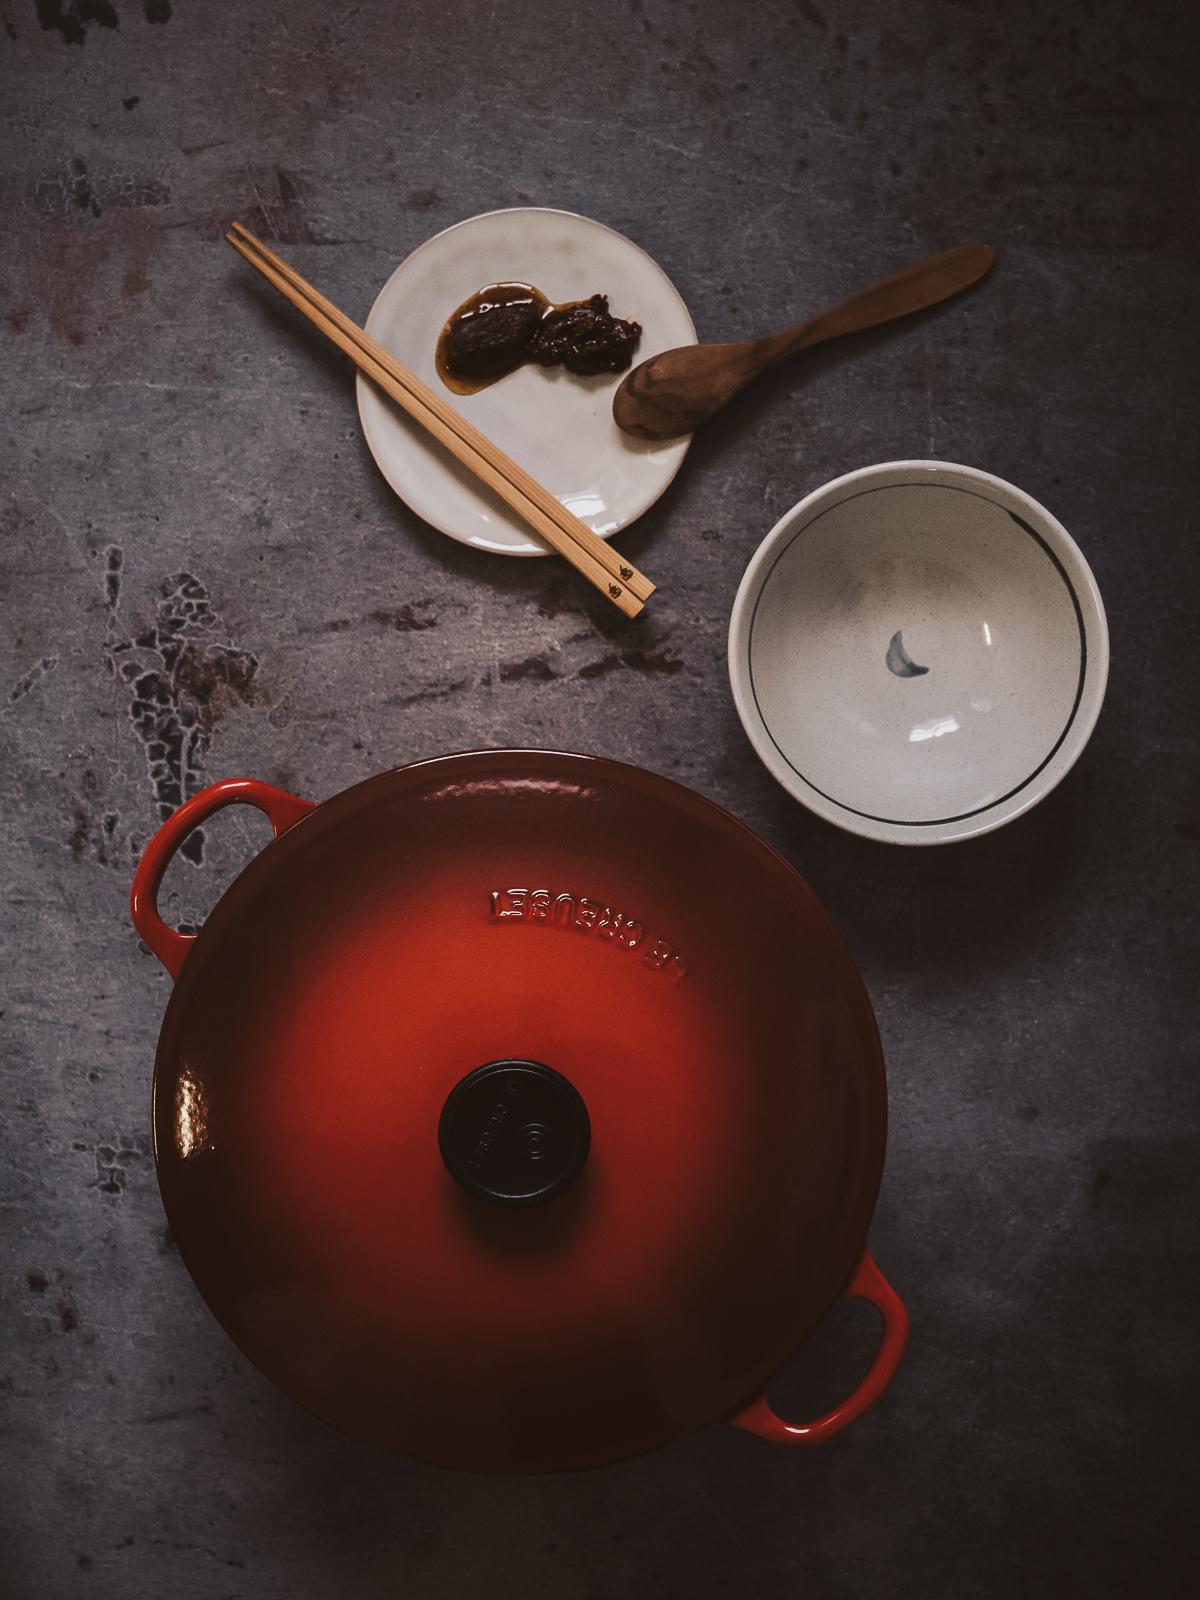 Ingolstadt Village Chinese New Year Lifestyle Shopping & Home Cooking - Olympus EM1Markii 2512 - Yes! Please Enjoy by Fanning Tseng-123.jpg